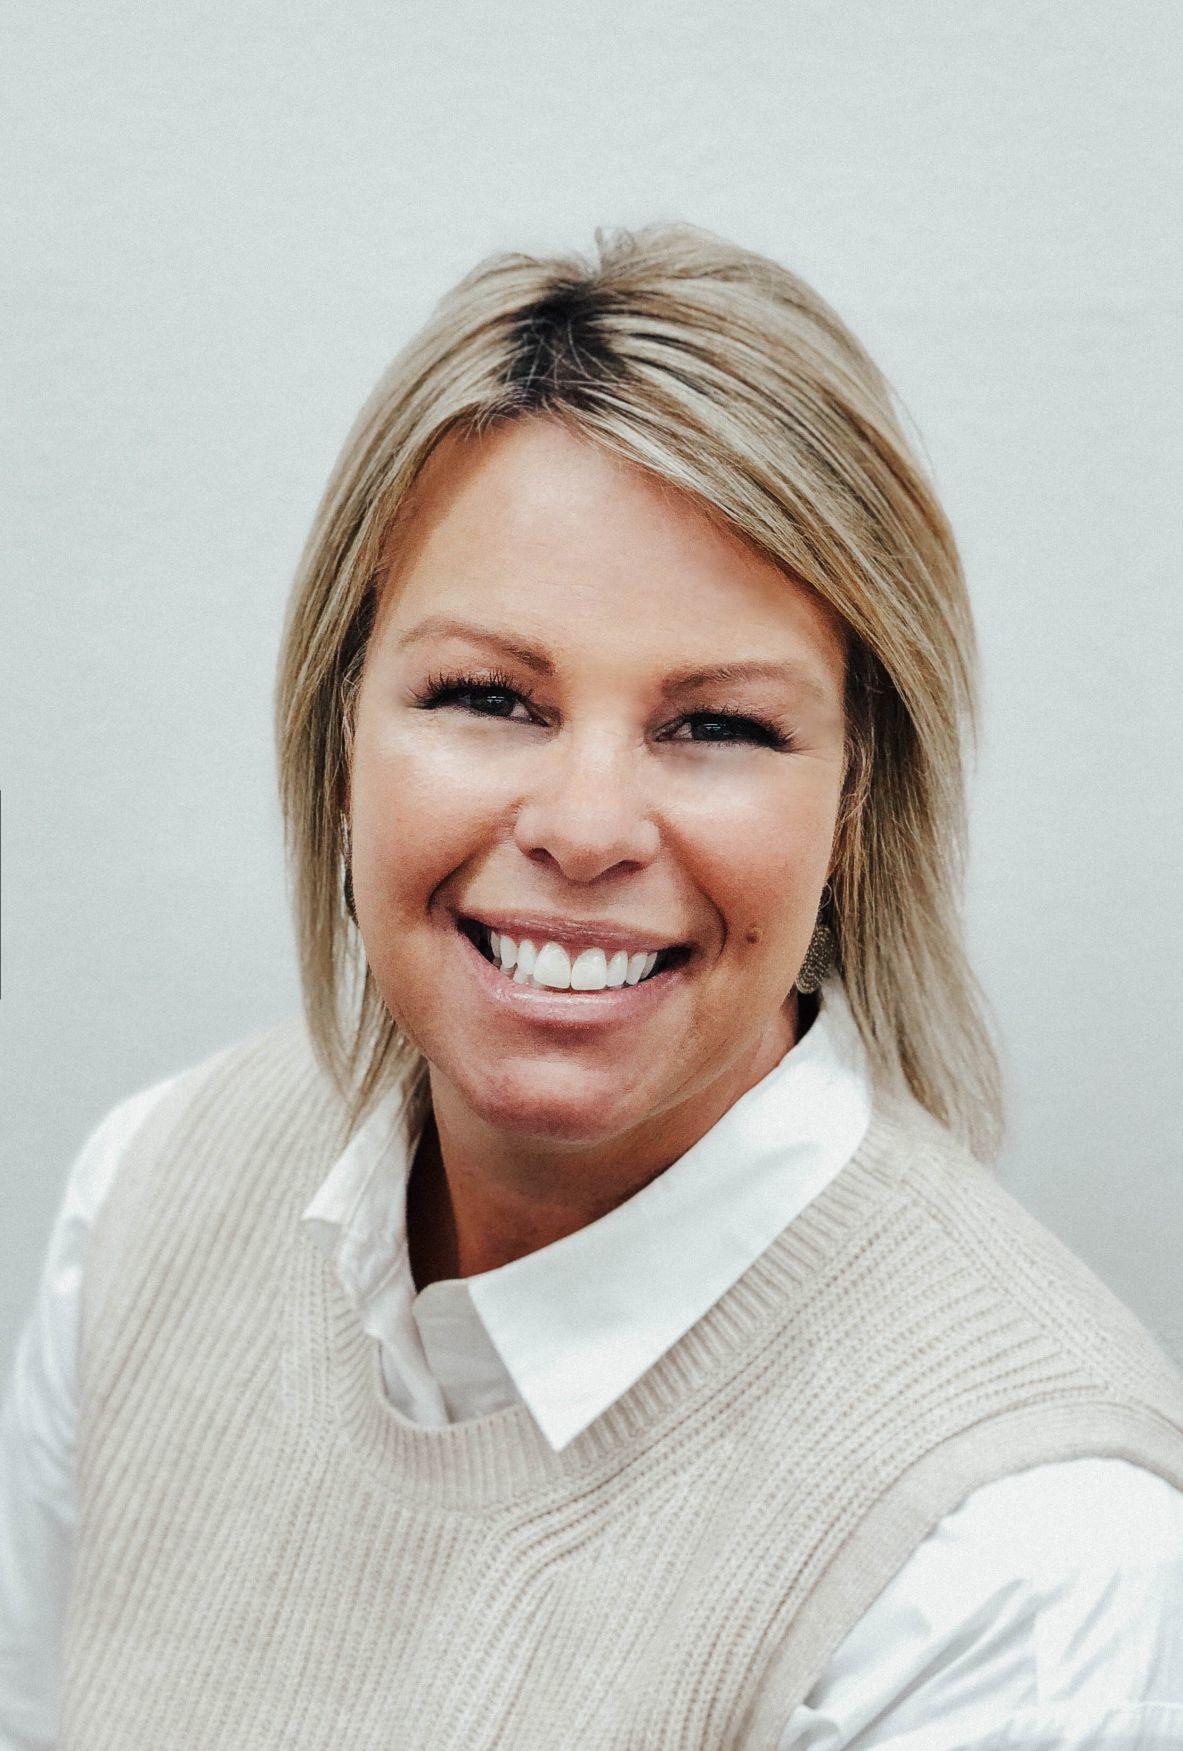 Debbie Critchfield